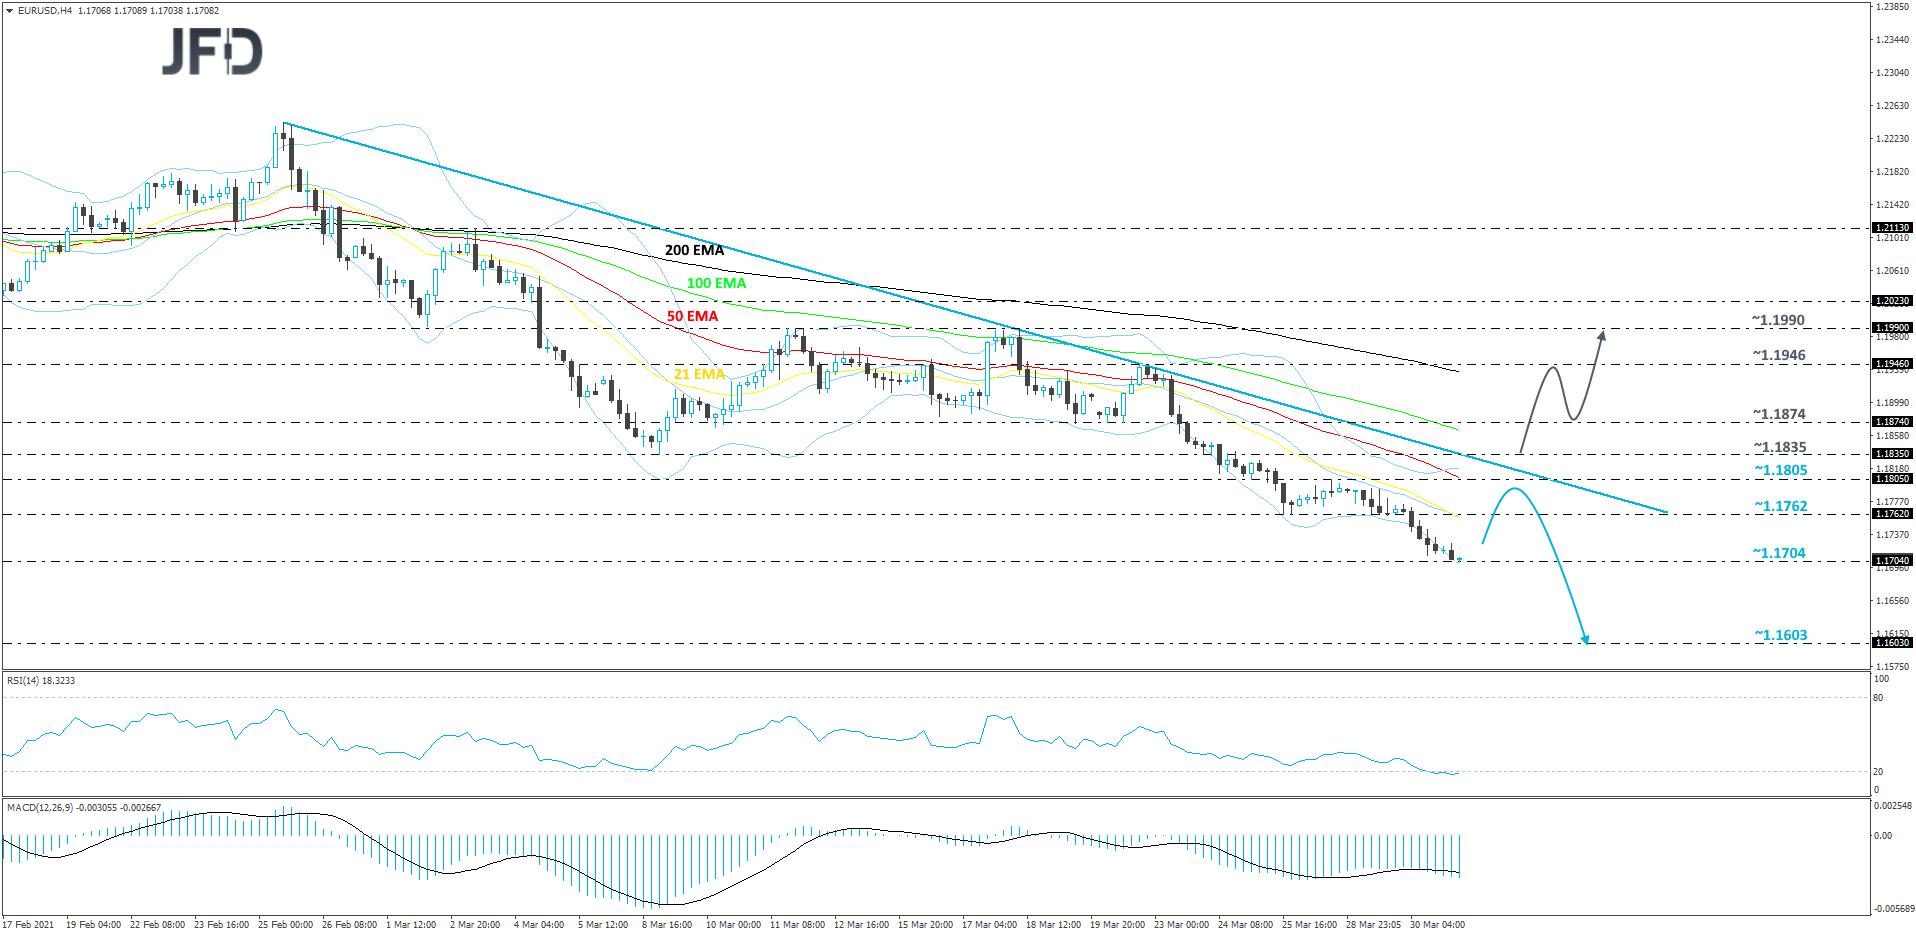 EUR/USD 4-hour chart technical analysis